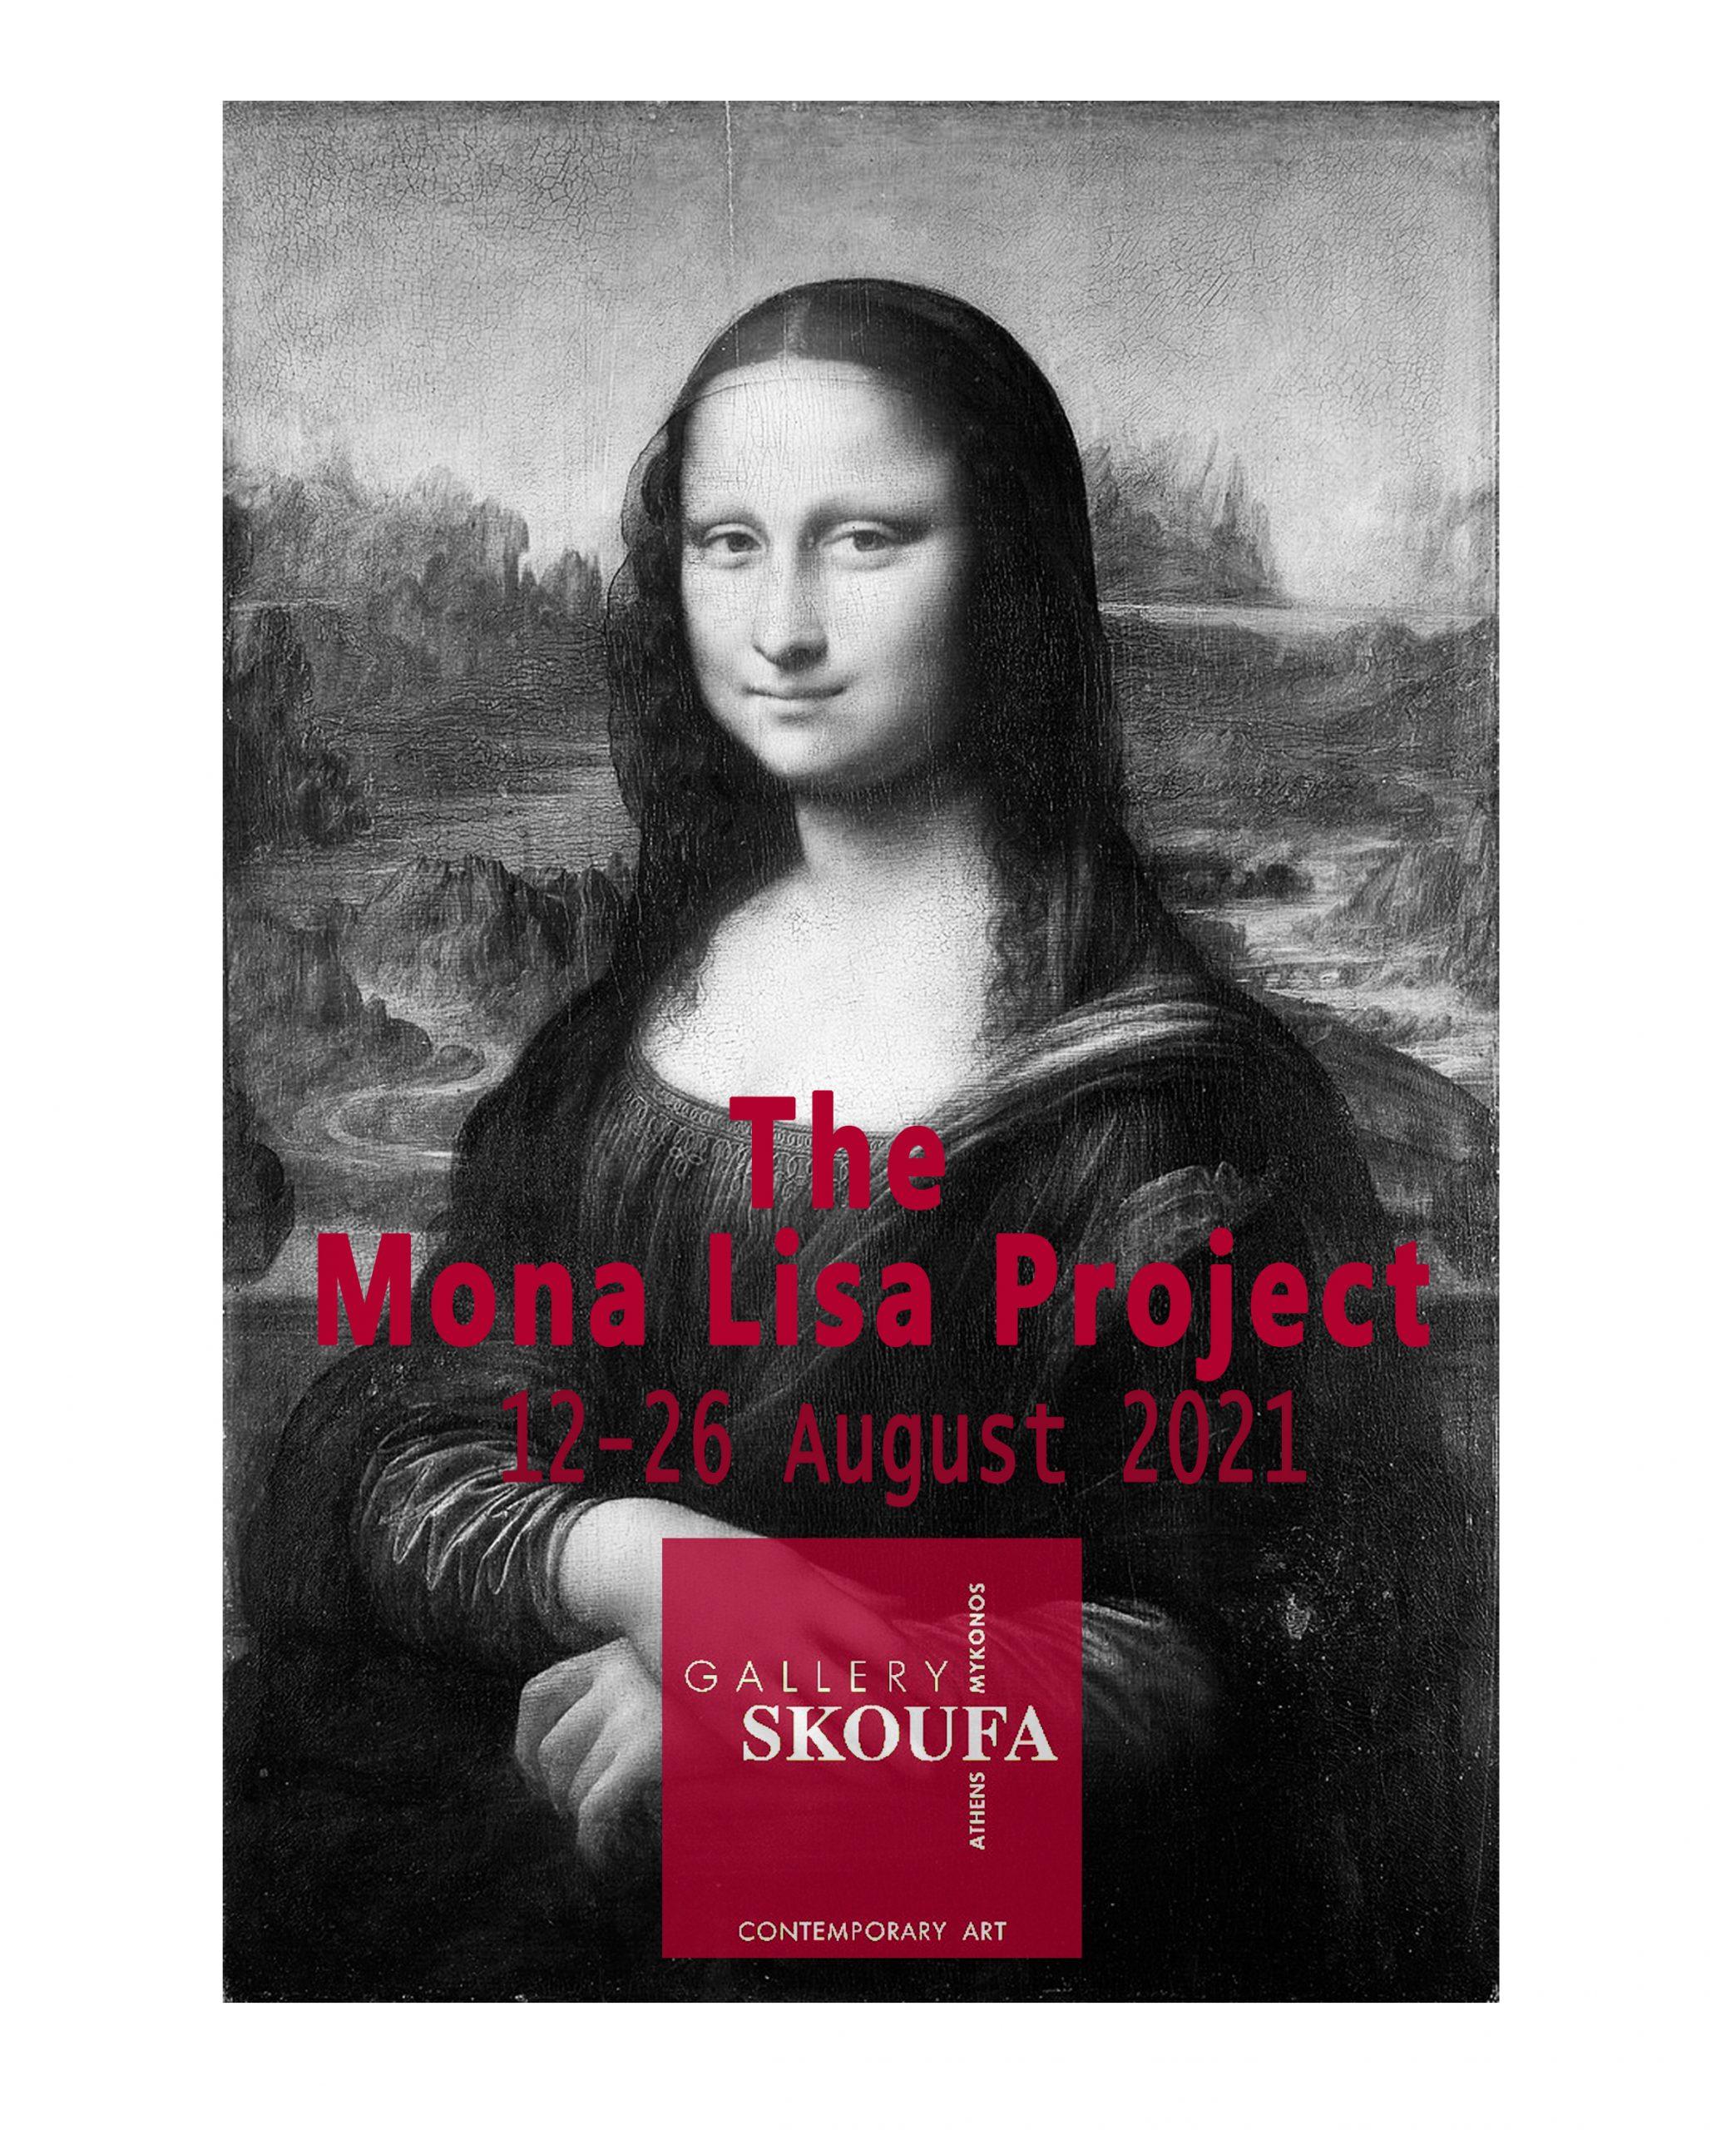 The Mona Lisa Project